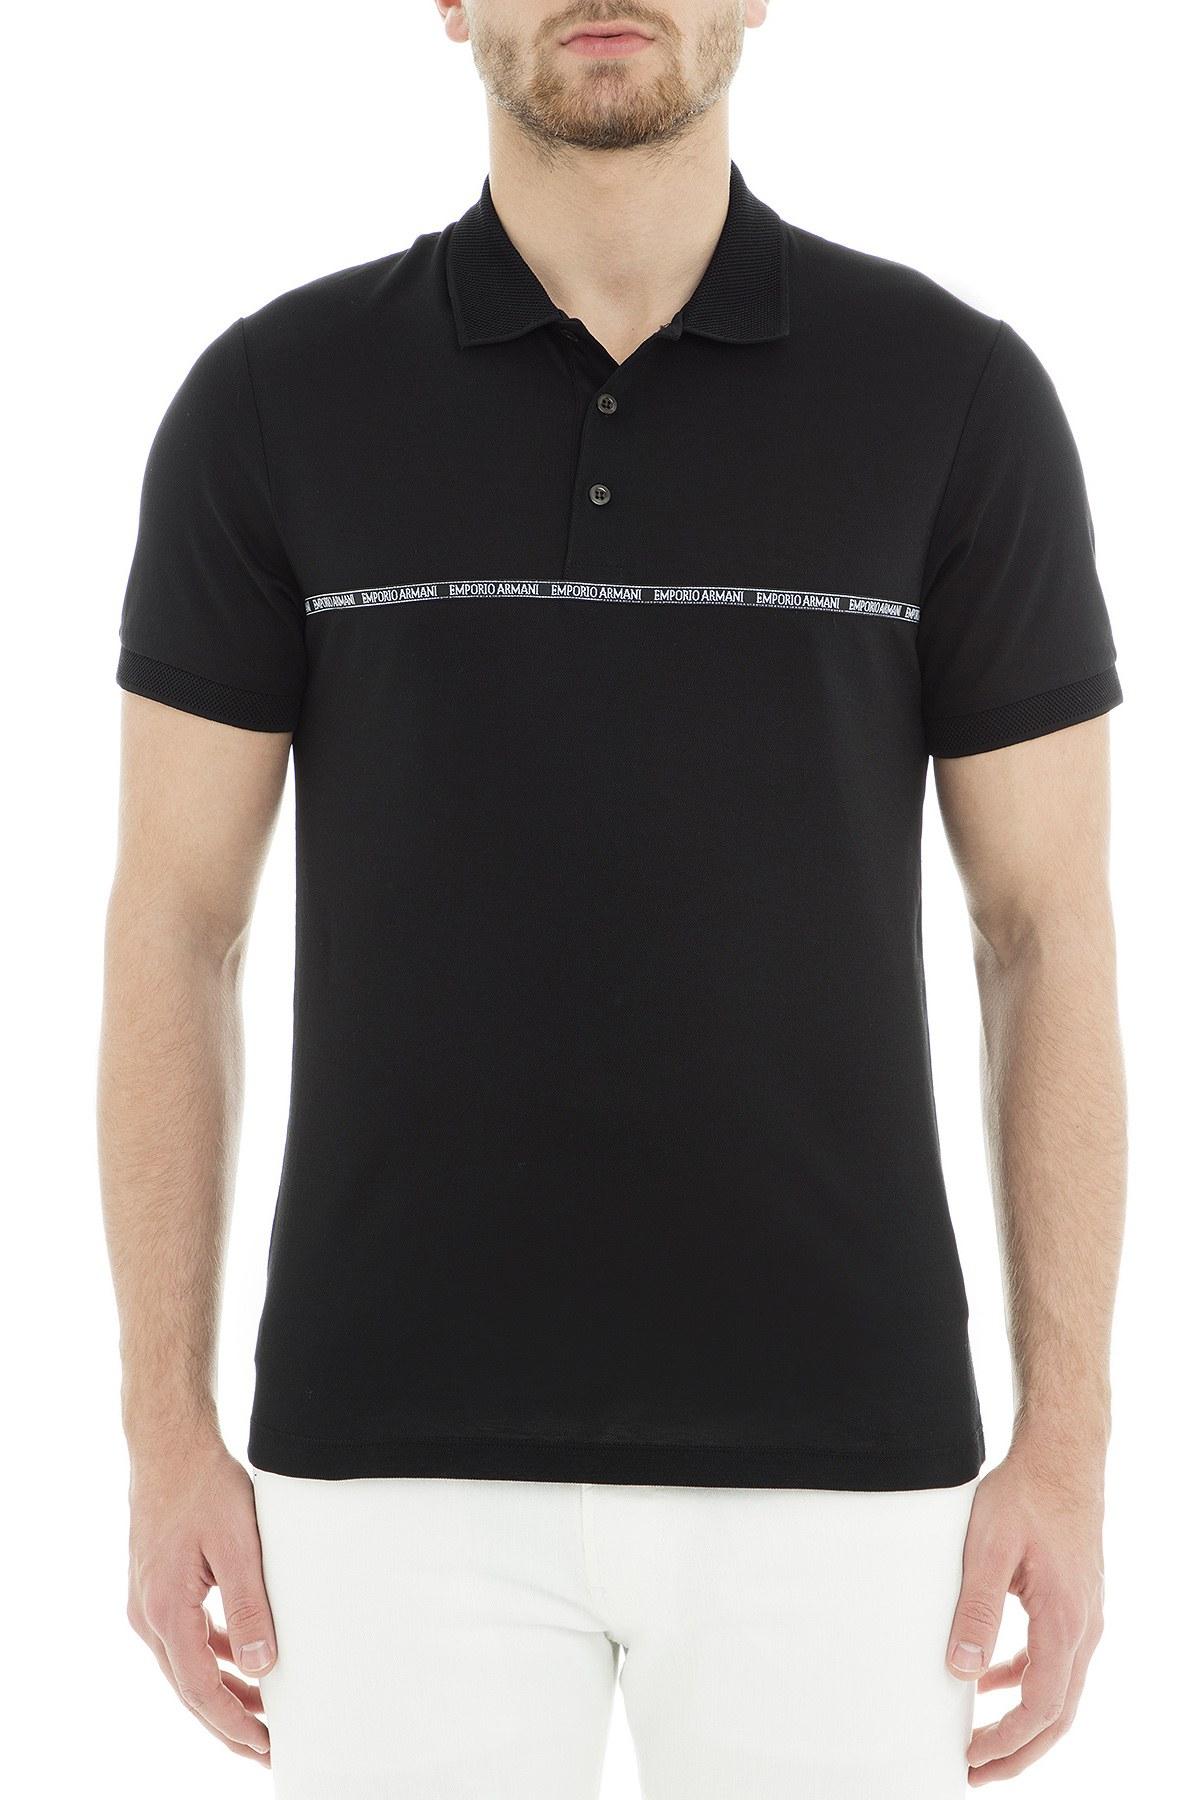 Emporio Armani Polo Erkek T Shirt 3G1FL2 1JBQZ 0999 SİYAH